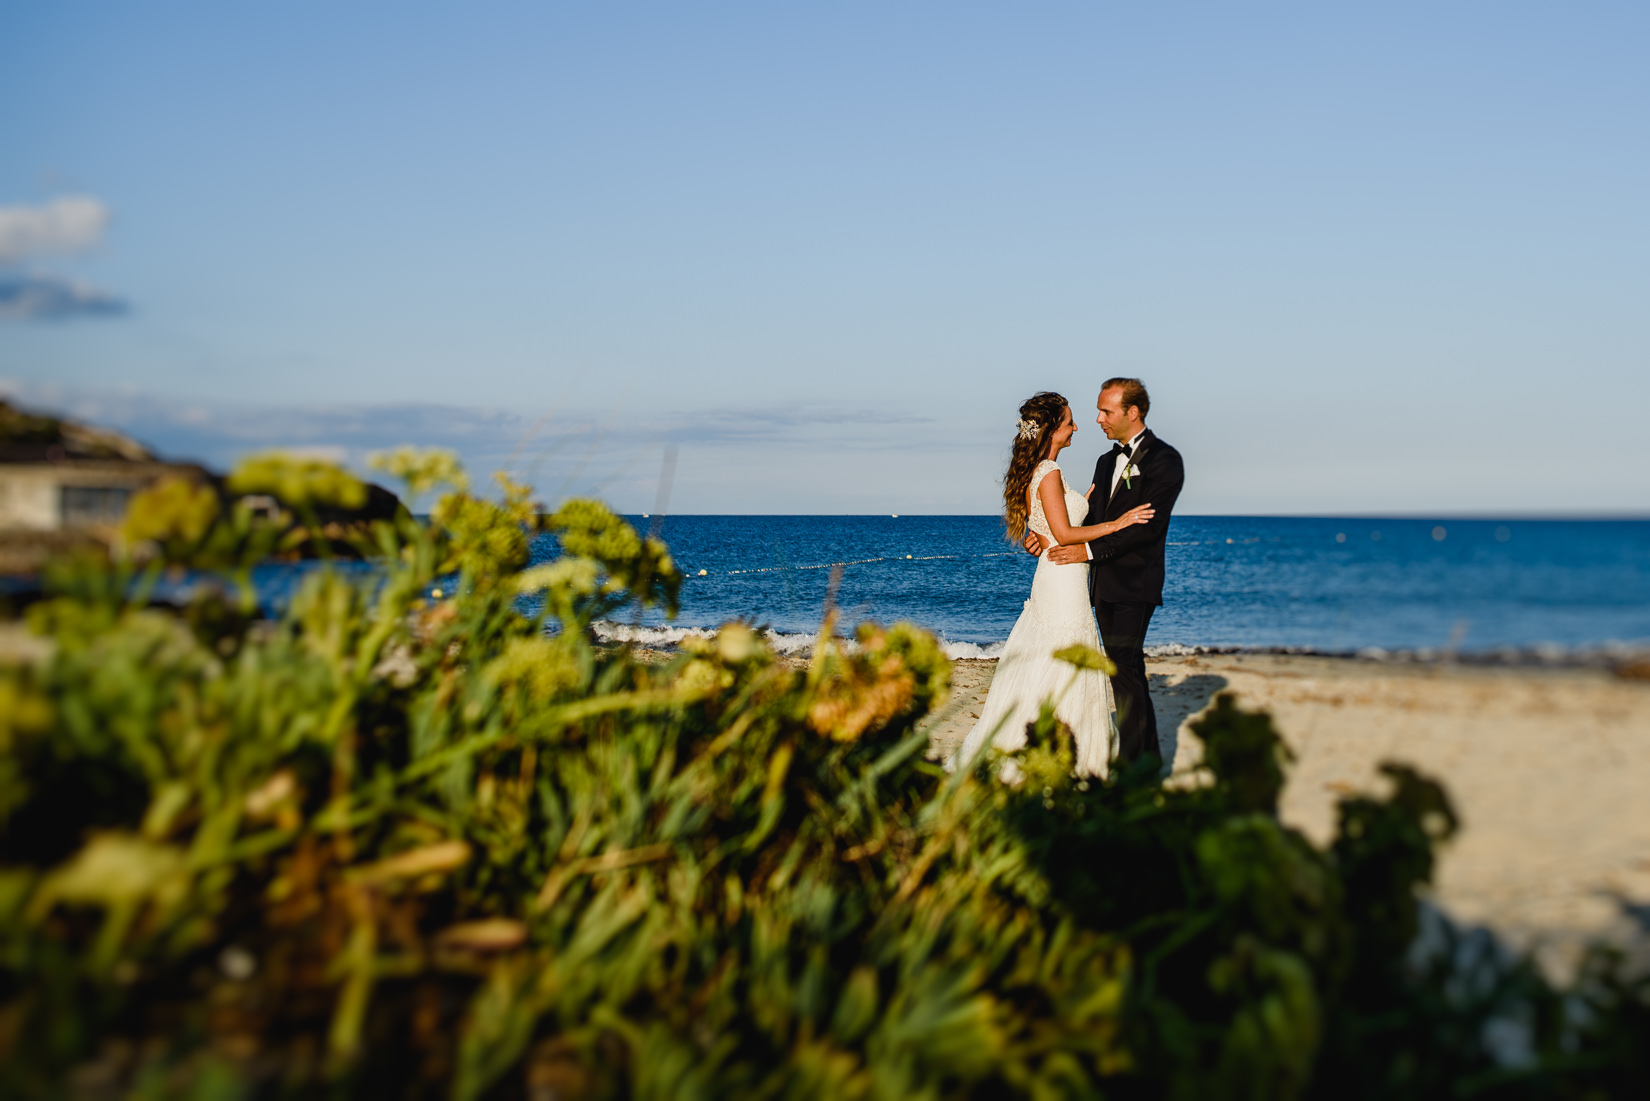 wedding-la-escollera-42.jpg